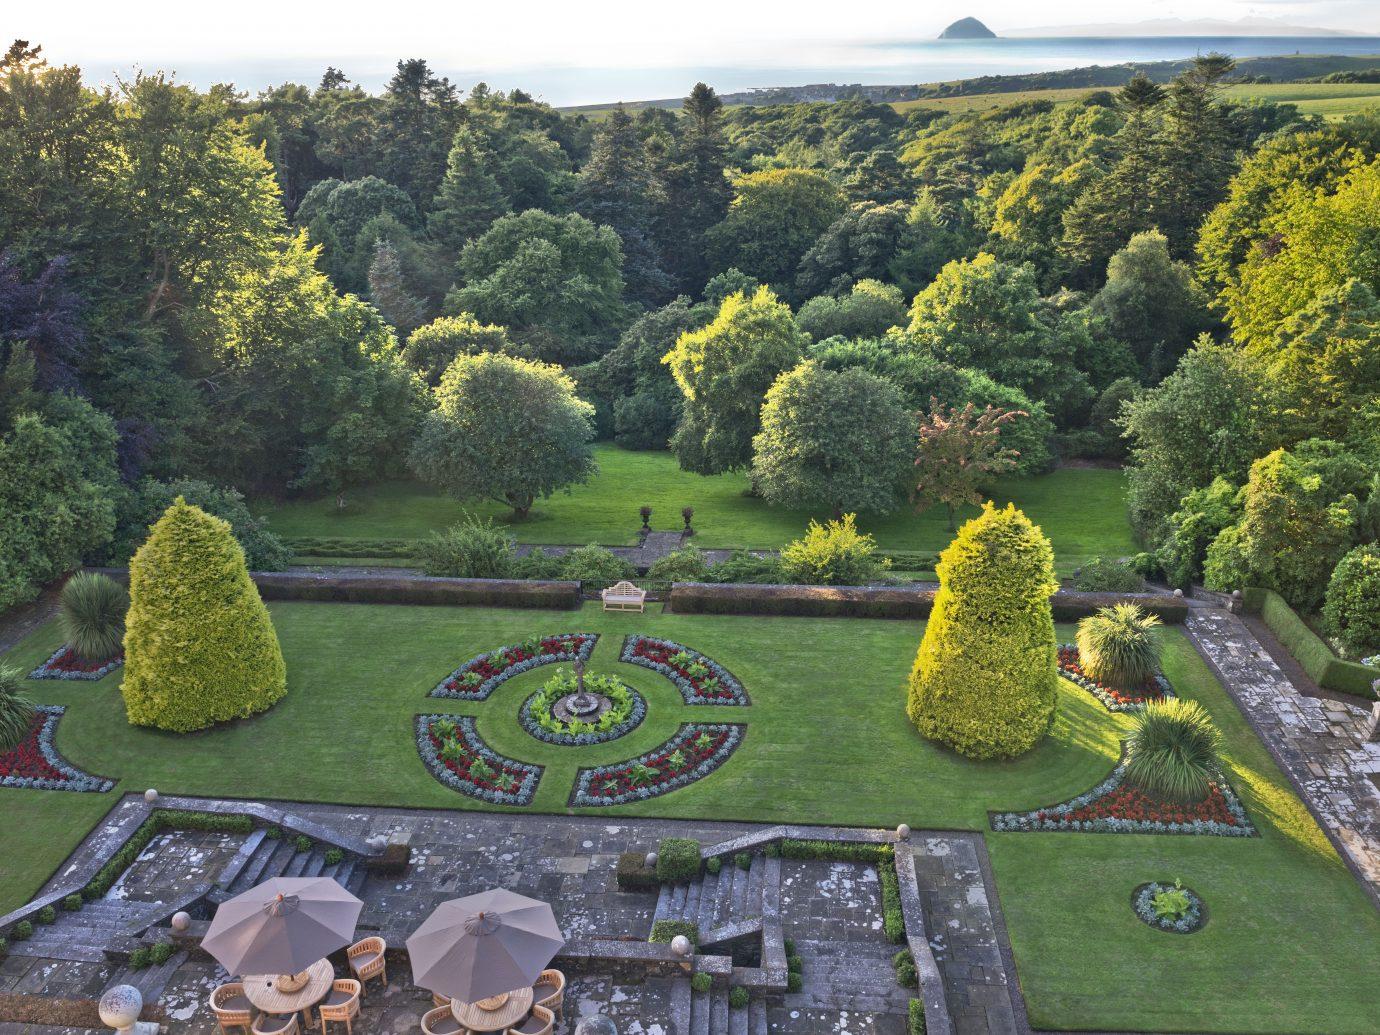 Glenapp castle grounds